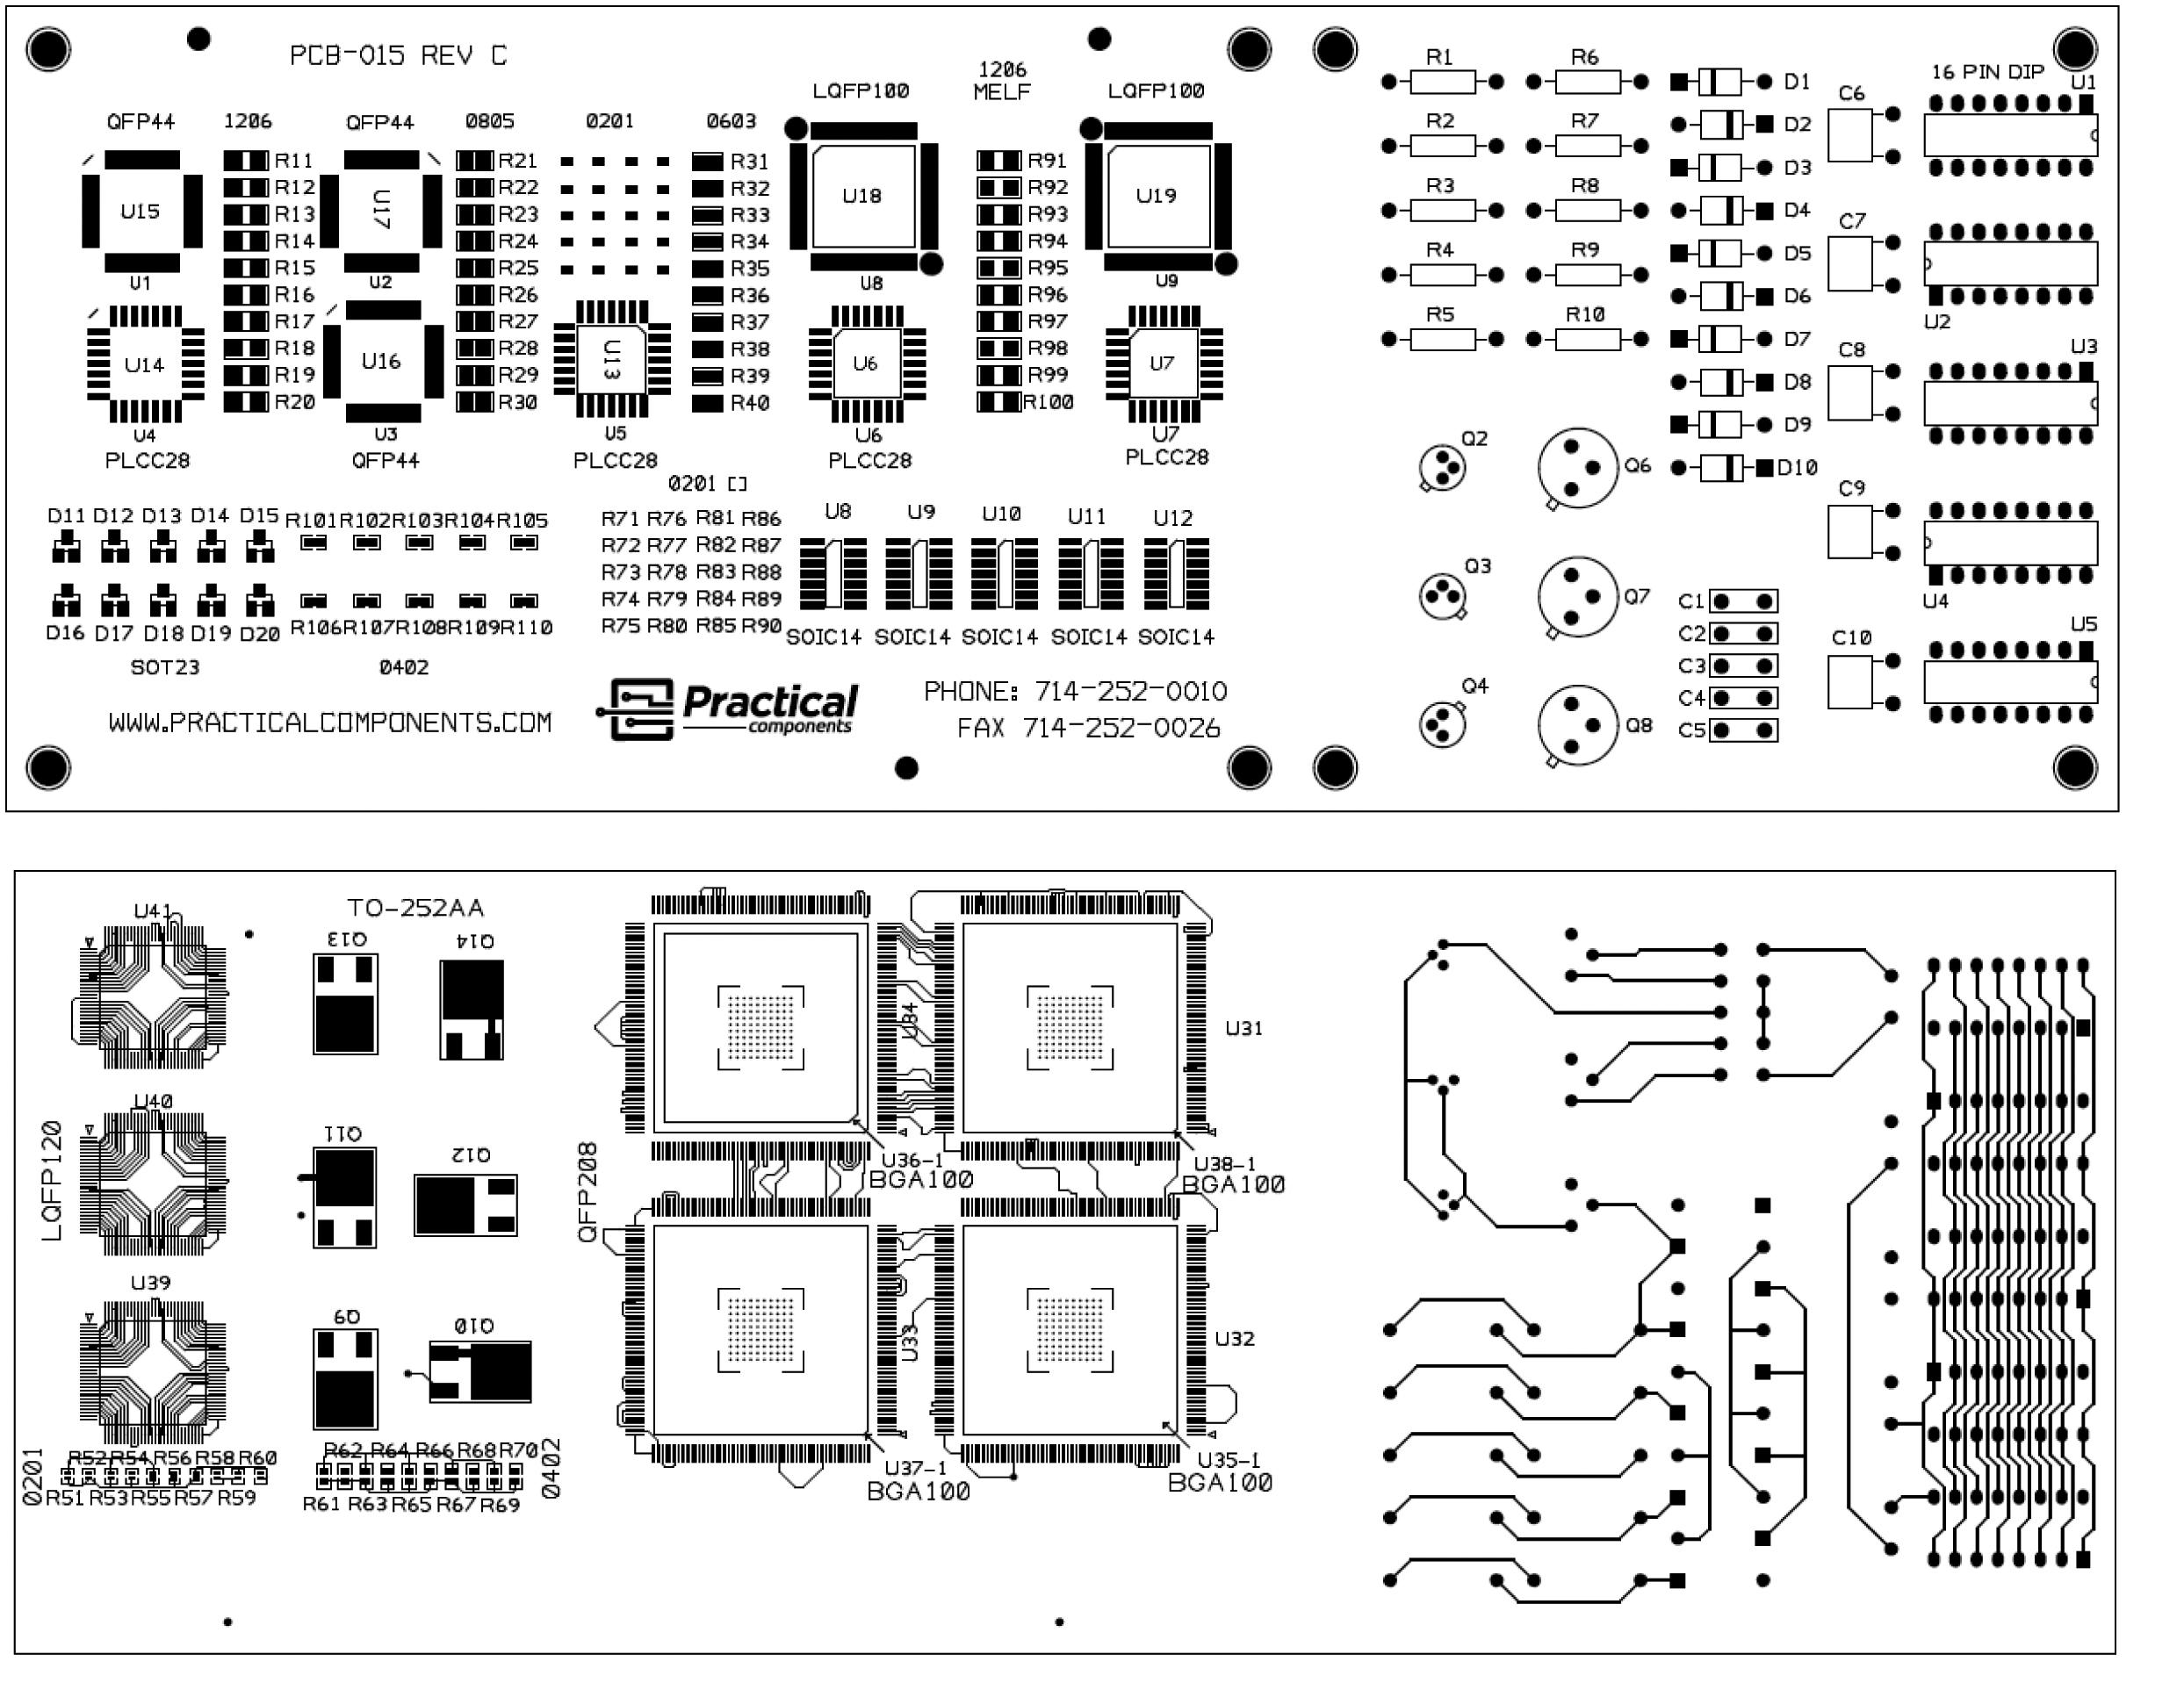 Practical Components Printed Circuit Board Repair Pcb Rework Modification Pc015 Rev C Ipc 7711 7721 Training Kit